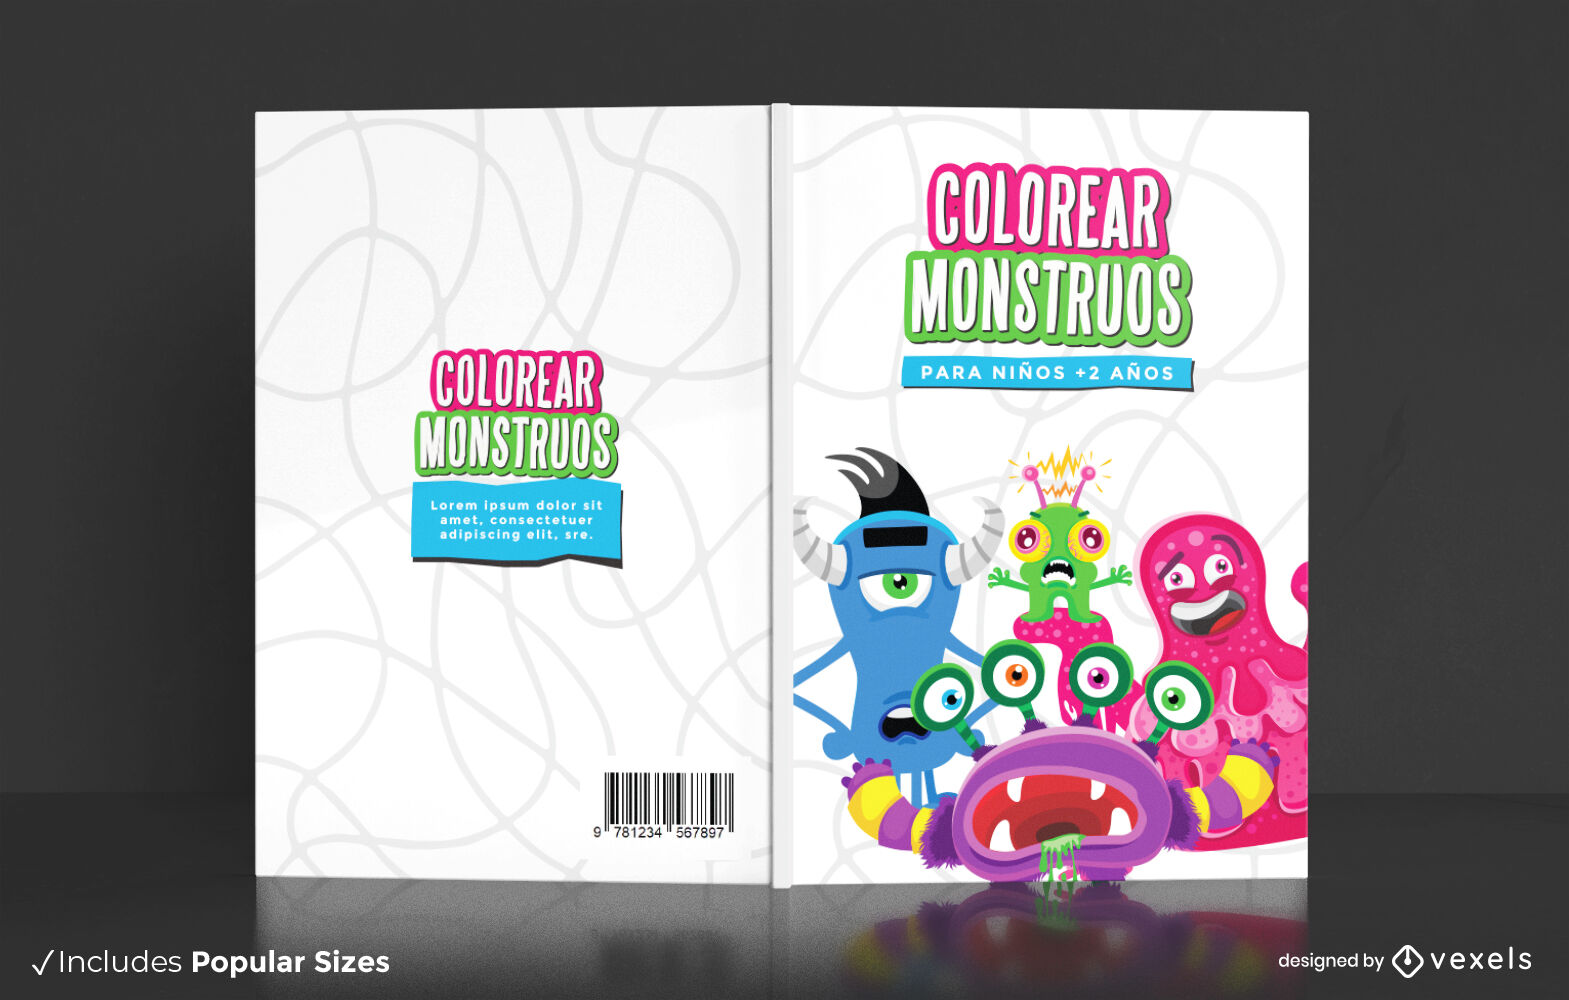 Monstruos de dibujos animados para colorear diseño de portada de libro